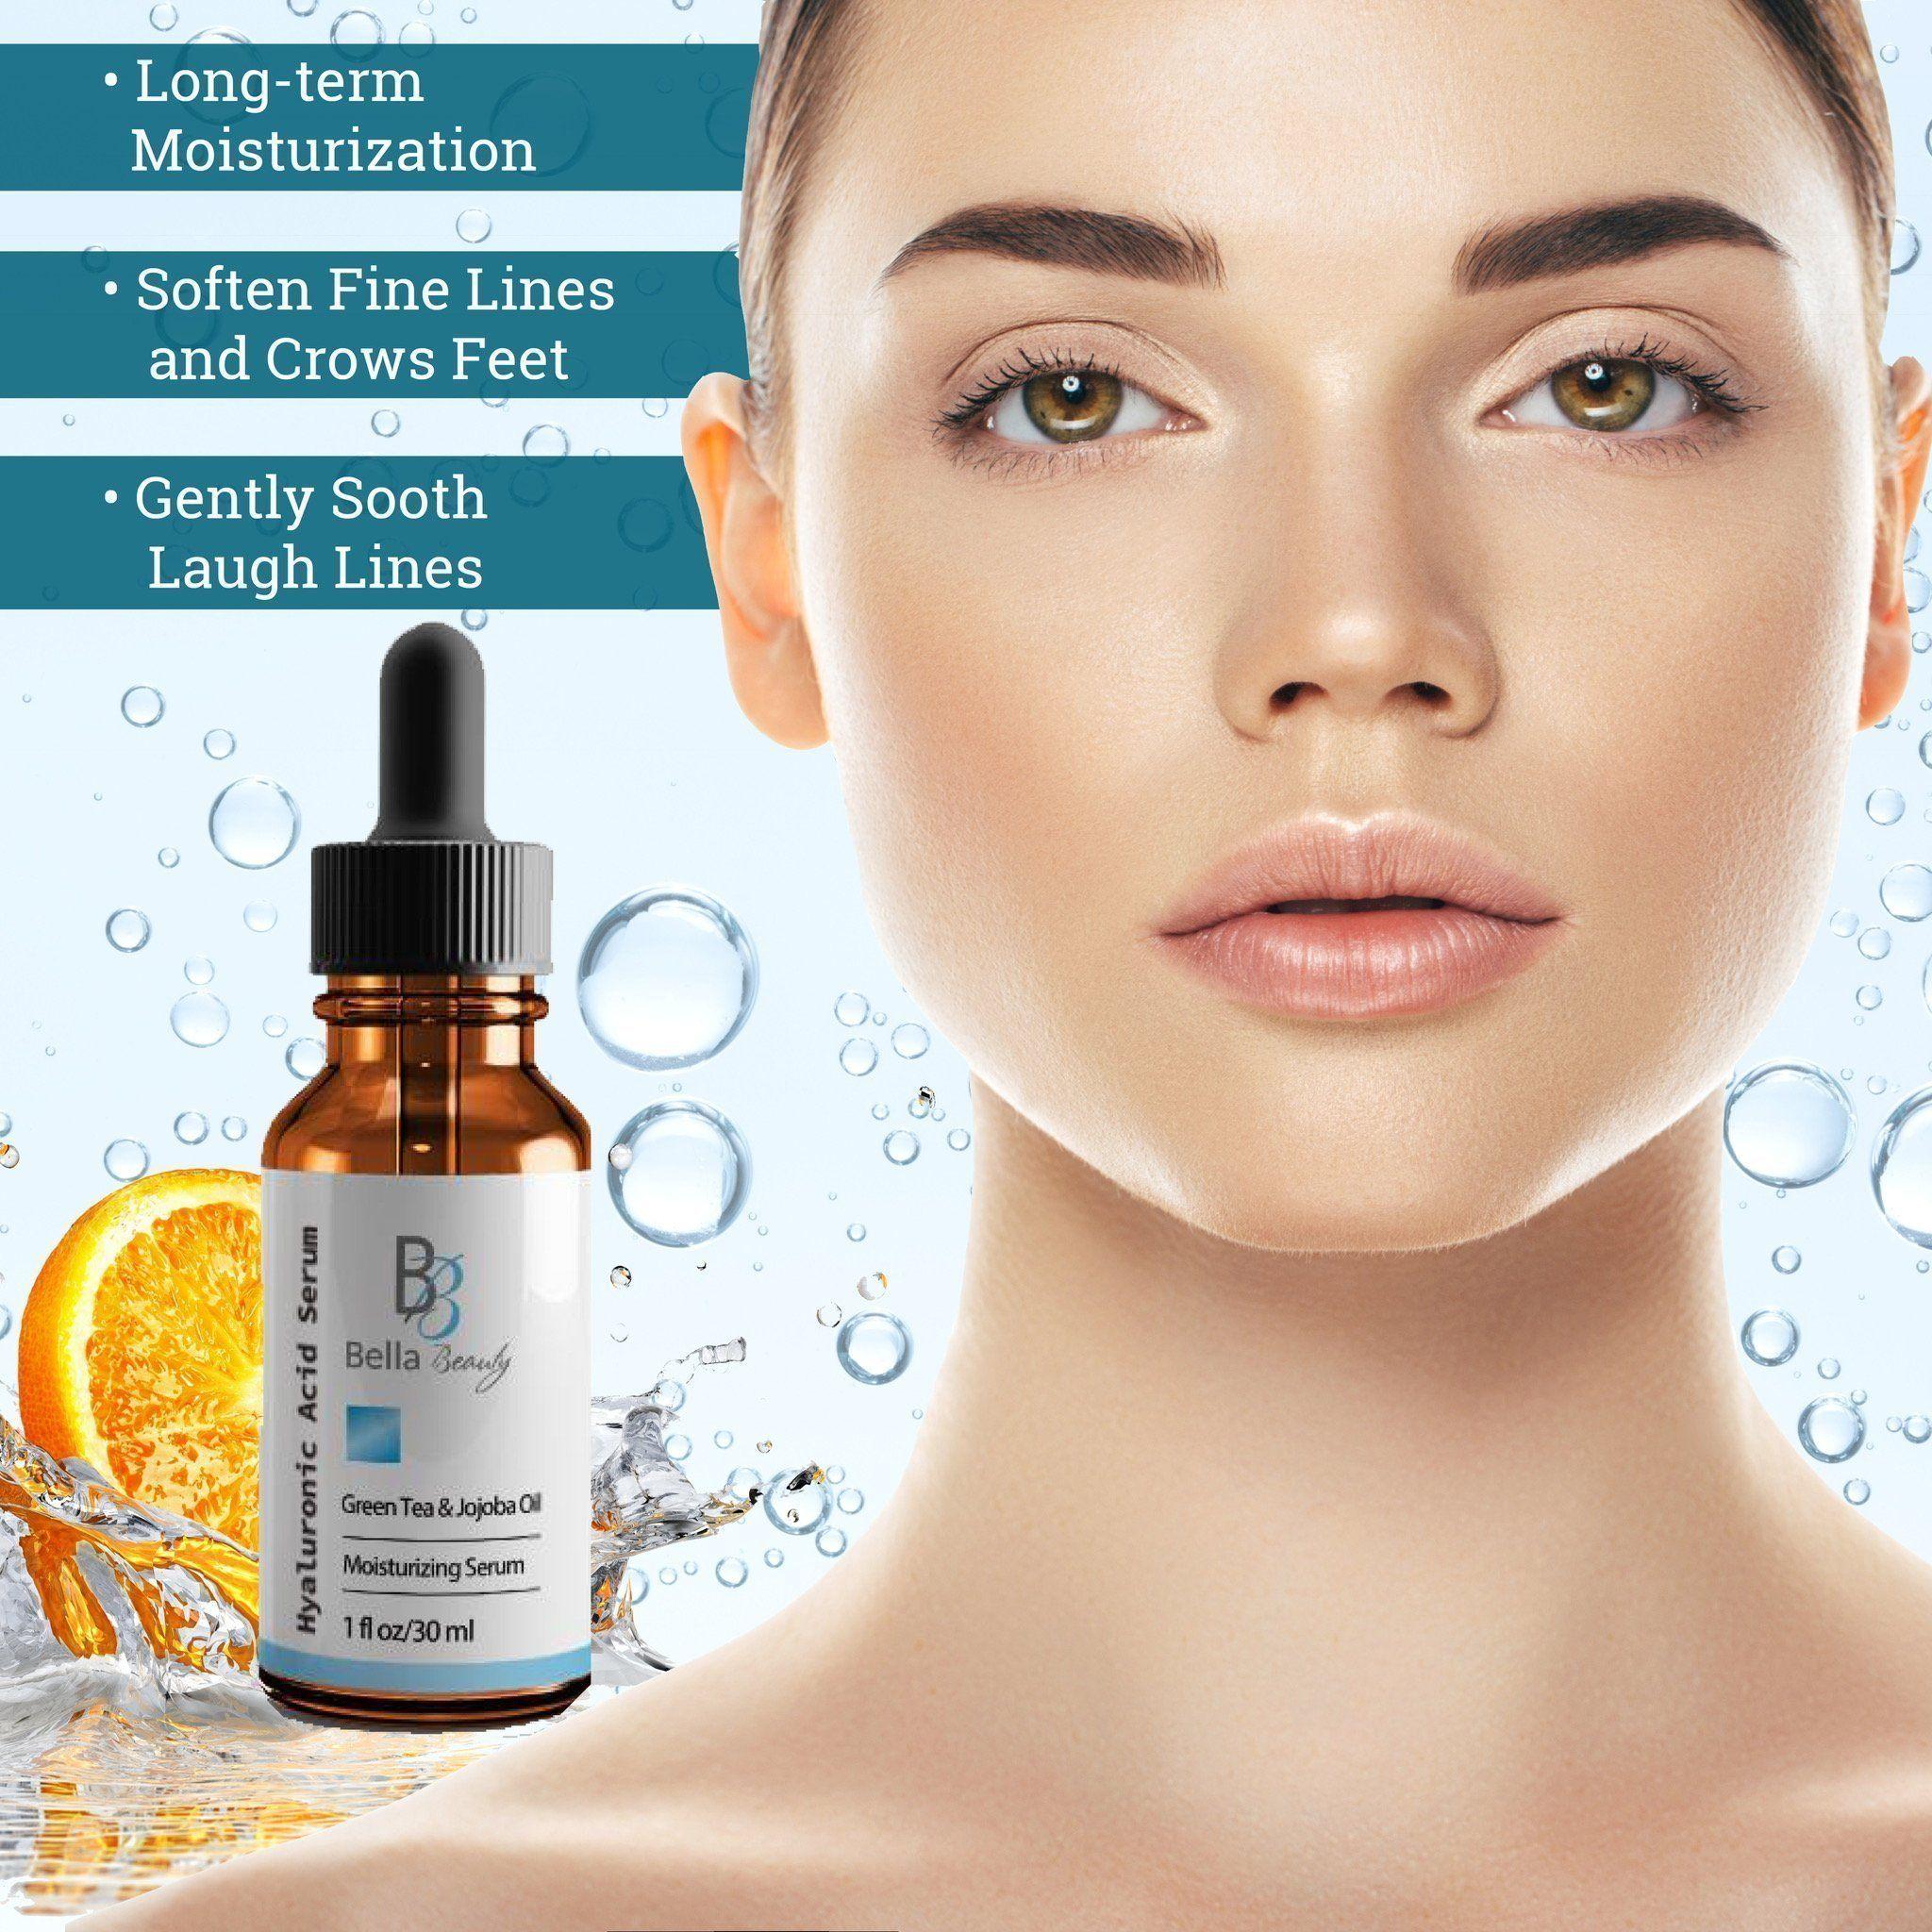 Hyaluronic Acid Serum with Vitamin C BestMakeupFoundation  Best